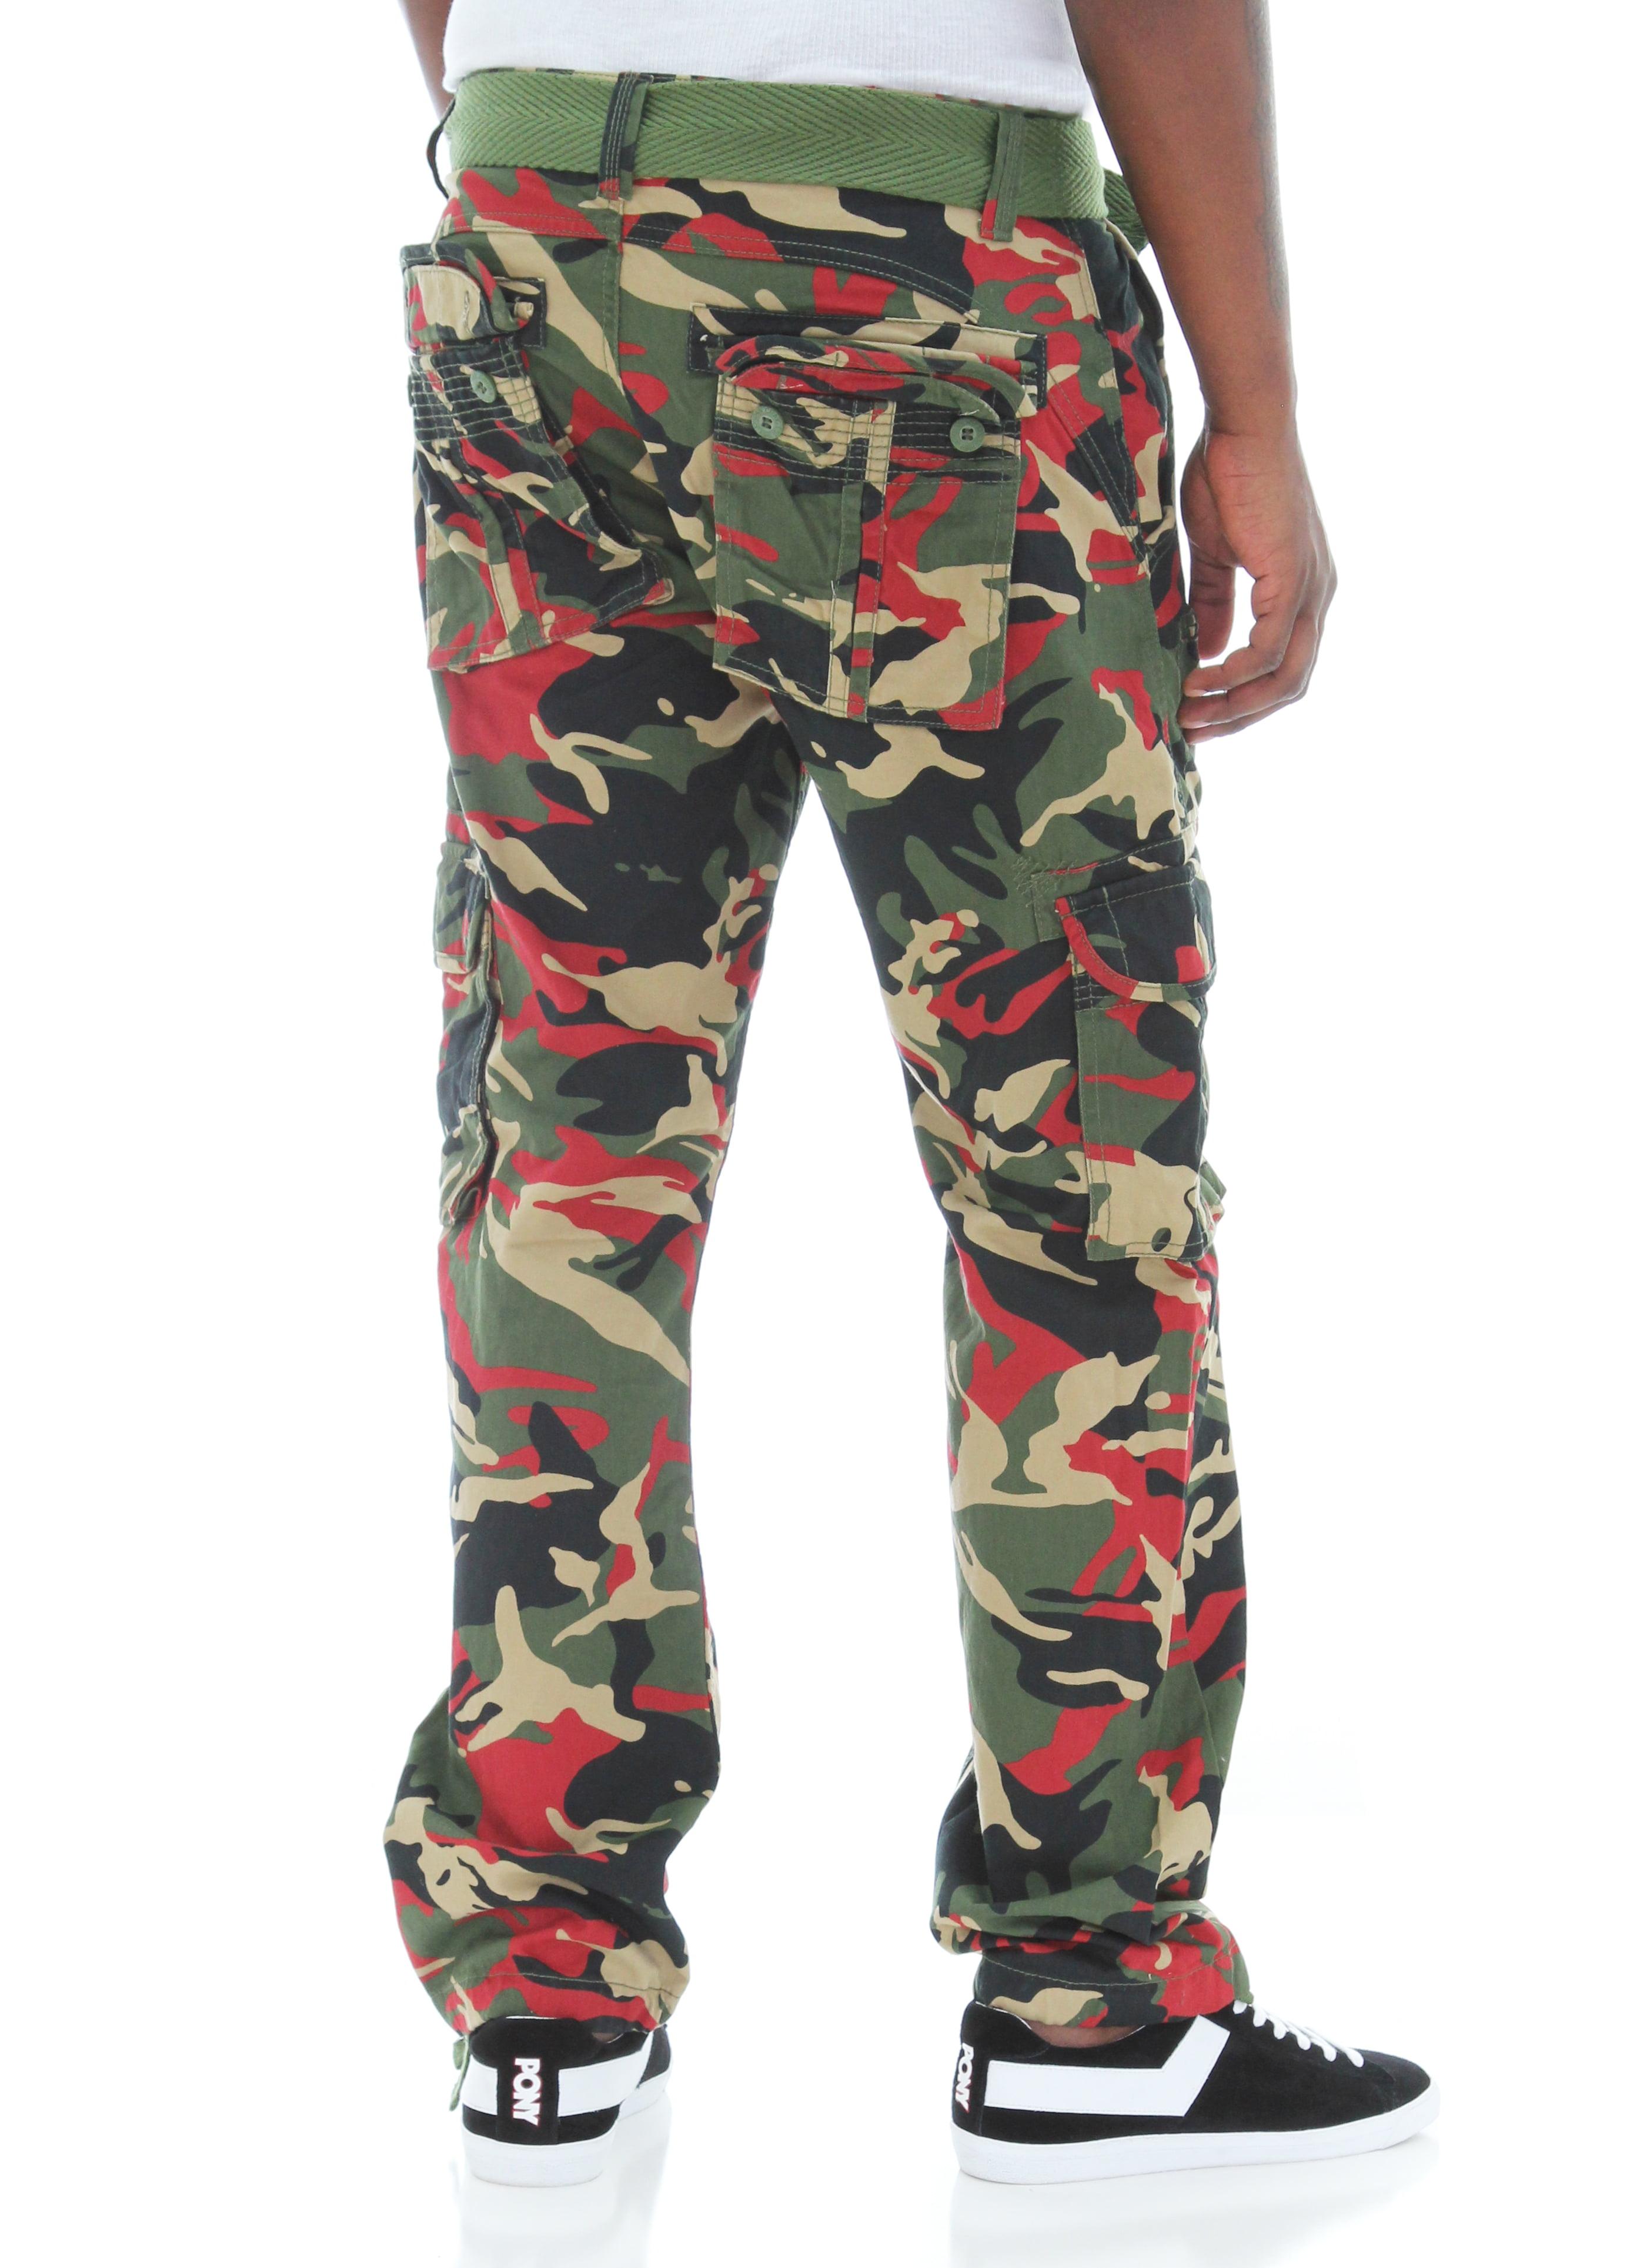 fdbb8022a746 Jordan Craig - Jordan Craig Men s Fashion Camo Heavy Twill Belted Cargo  Pants - Walmart.com